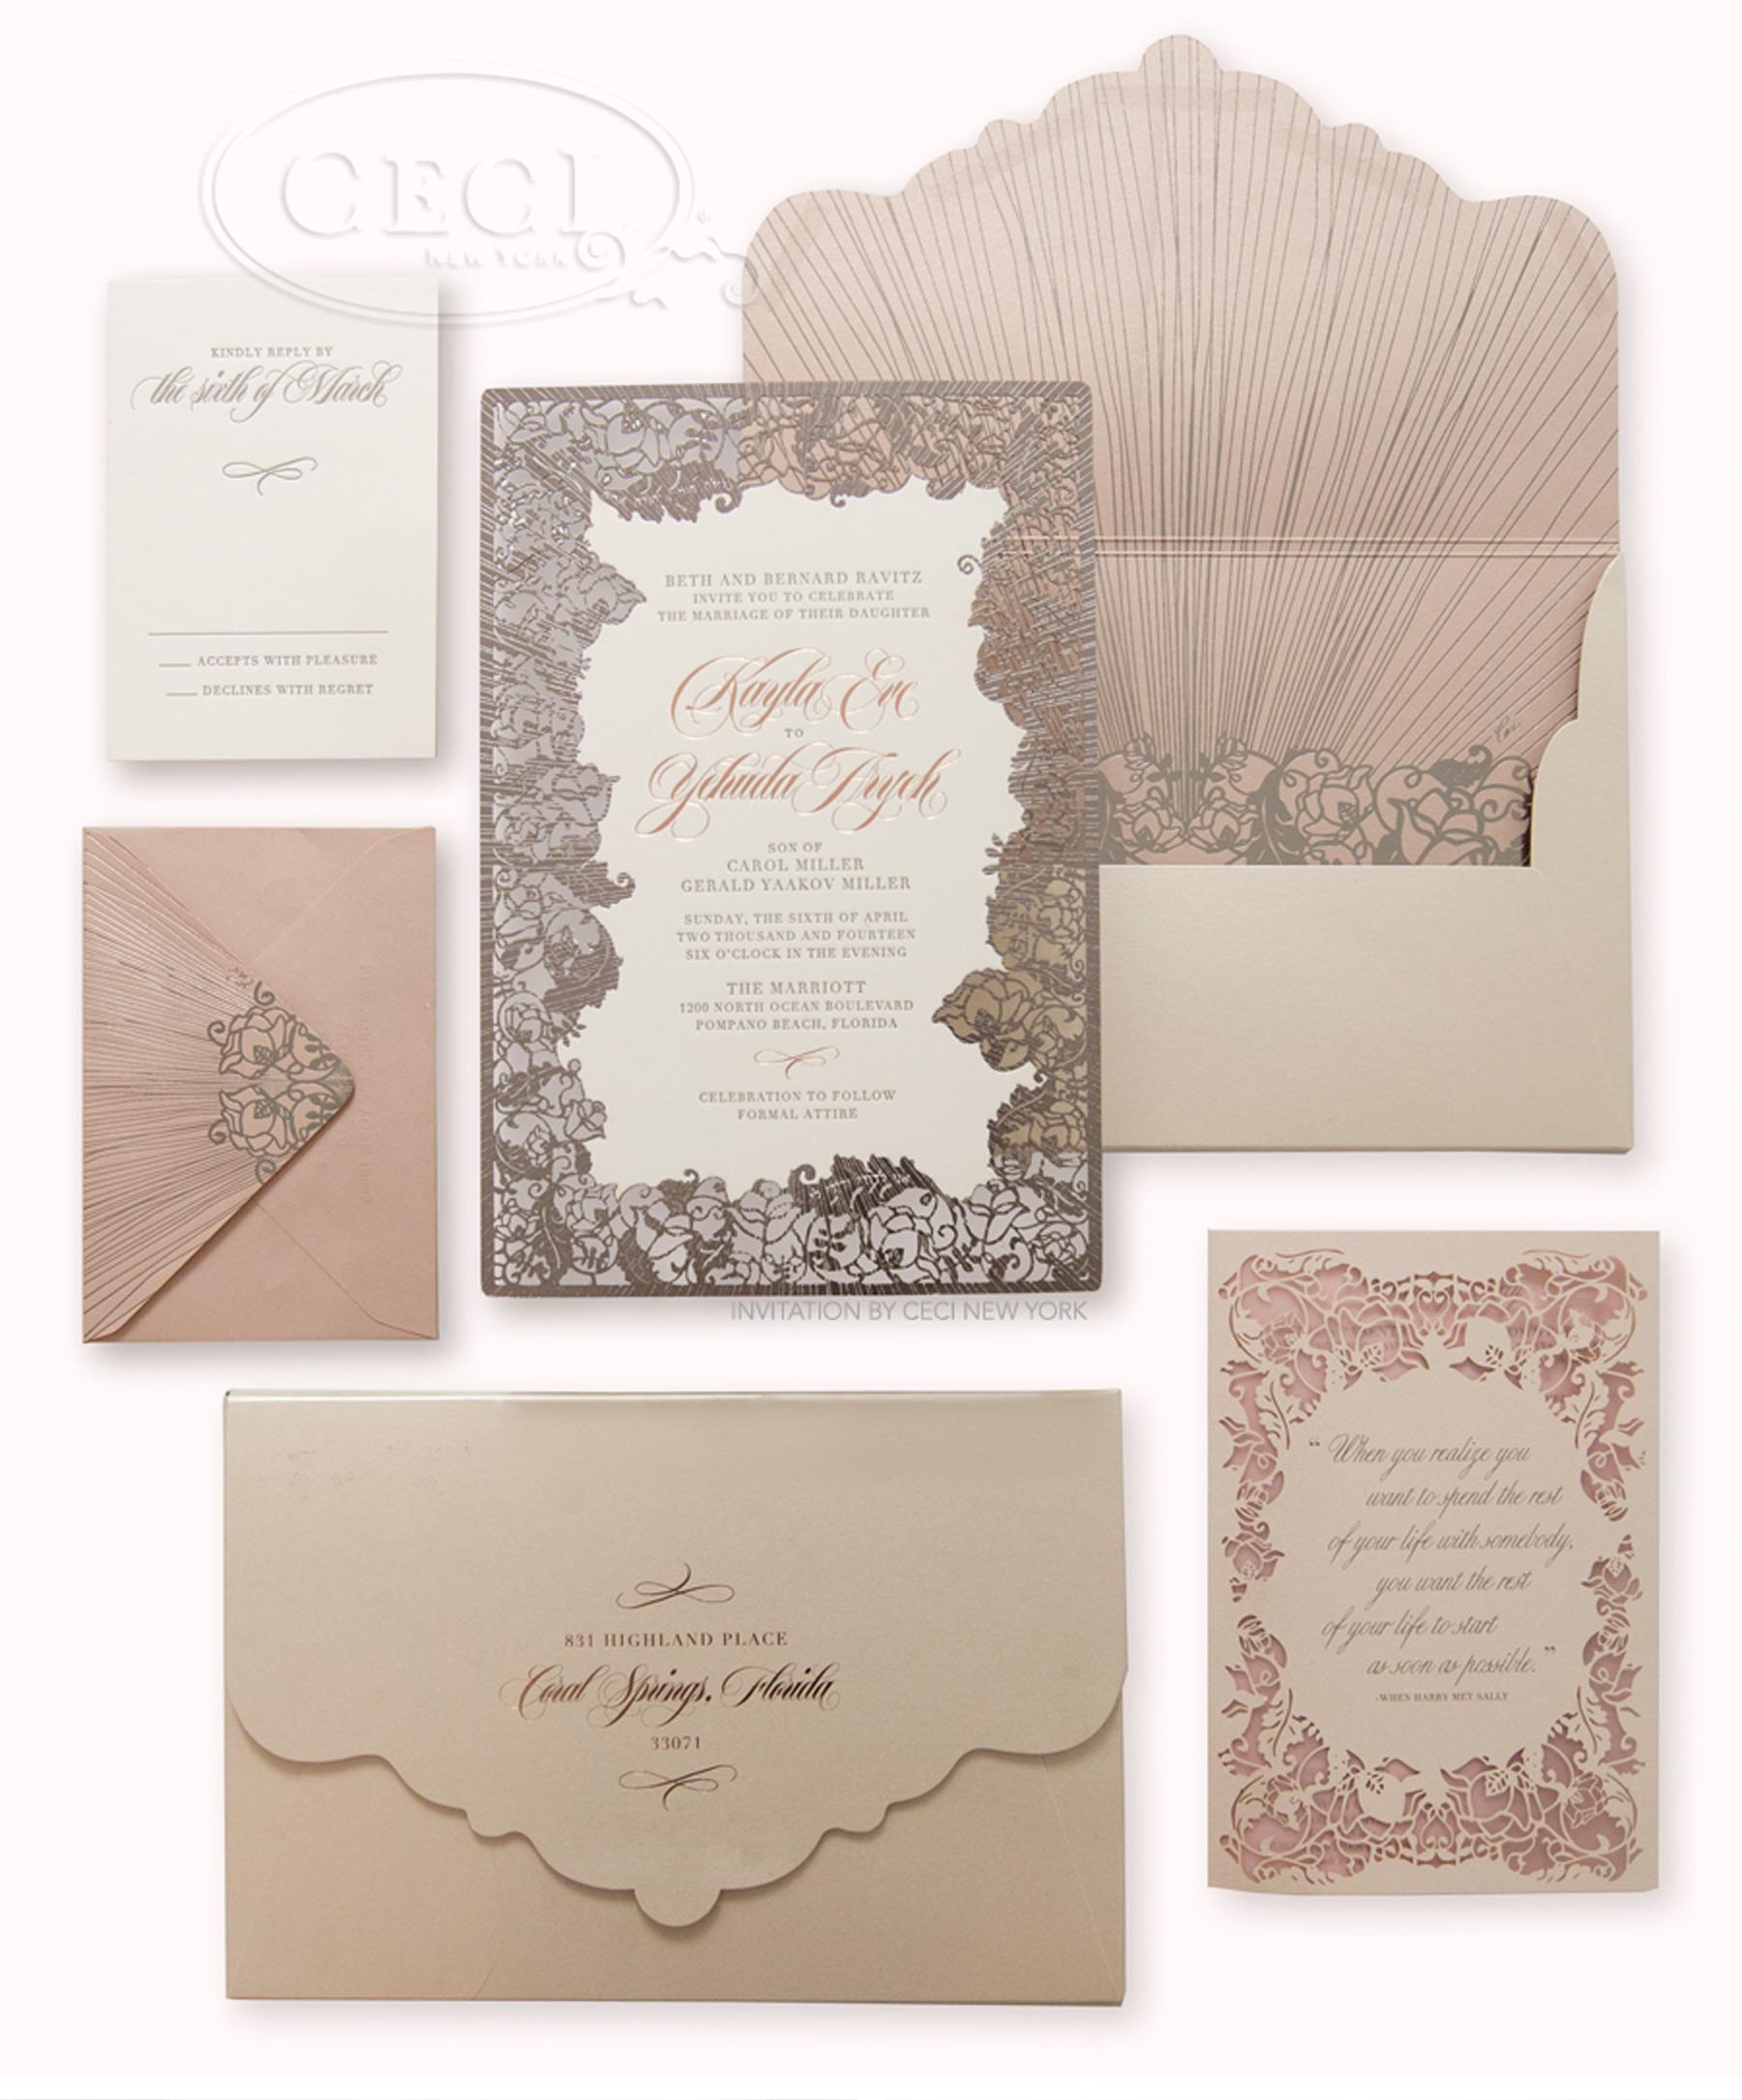 Zazzle Wedding Invitations.Zazzle Wedding Invitations